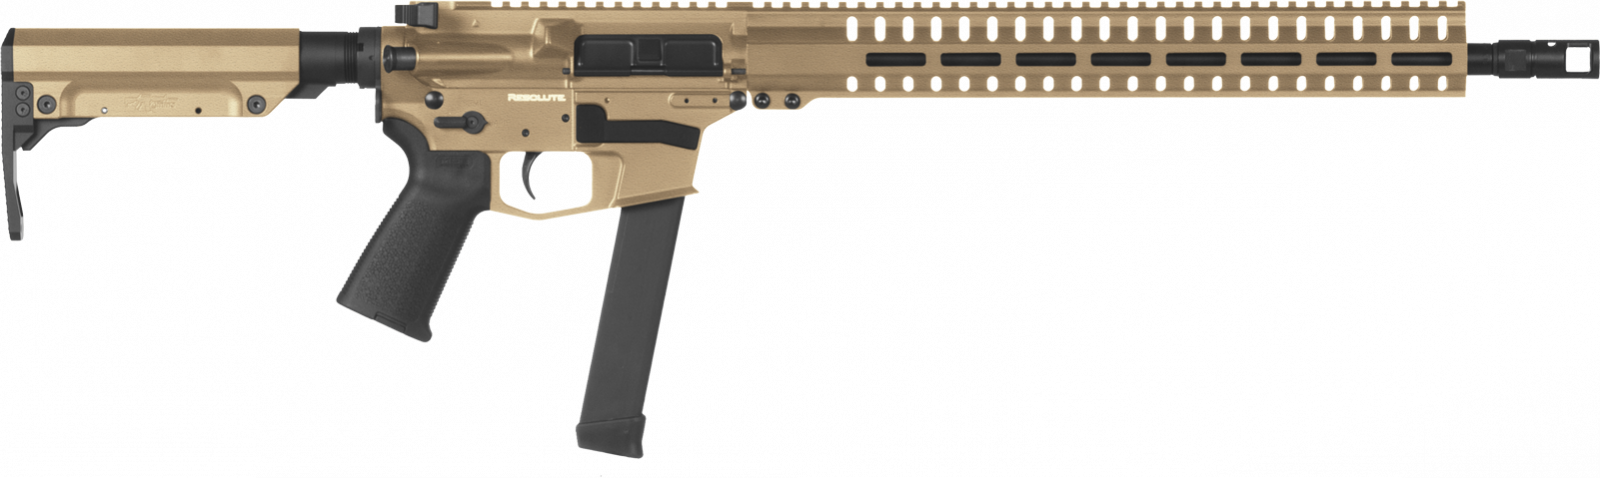 Samonabíjecí puška CMMG Resolute 300 Rifle MkGs - 9 x 19, FDE